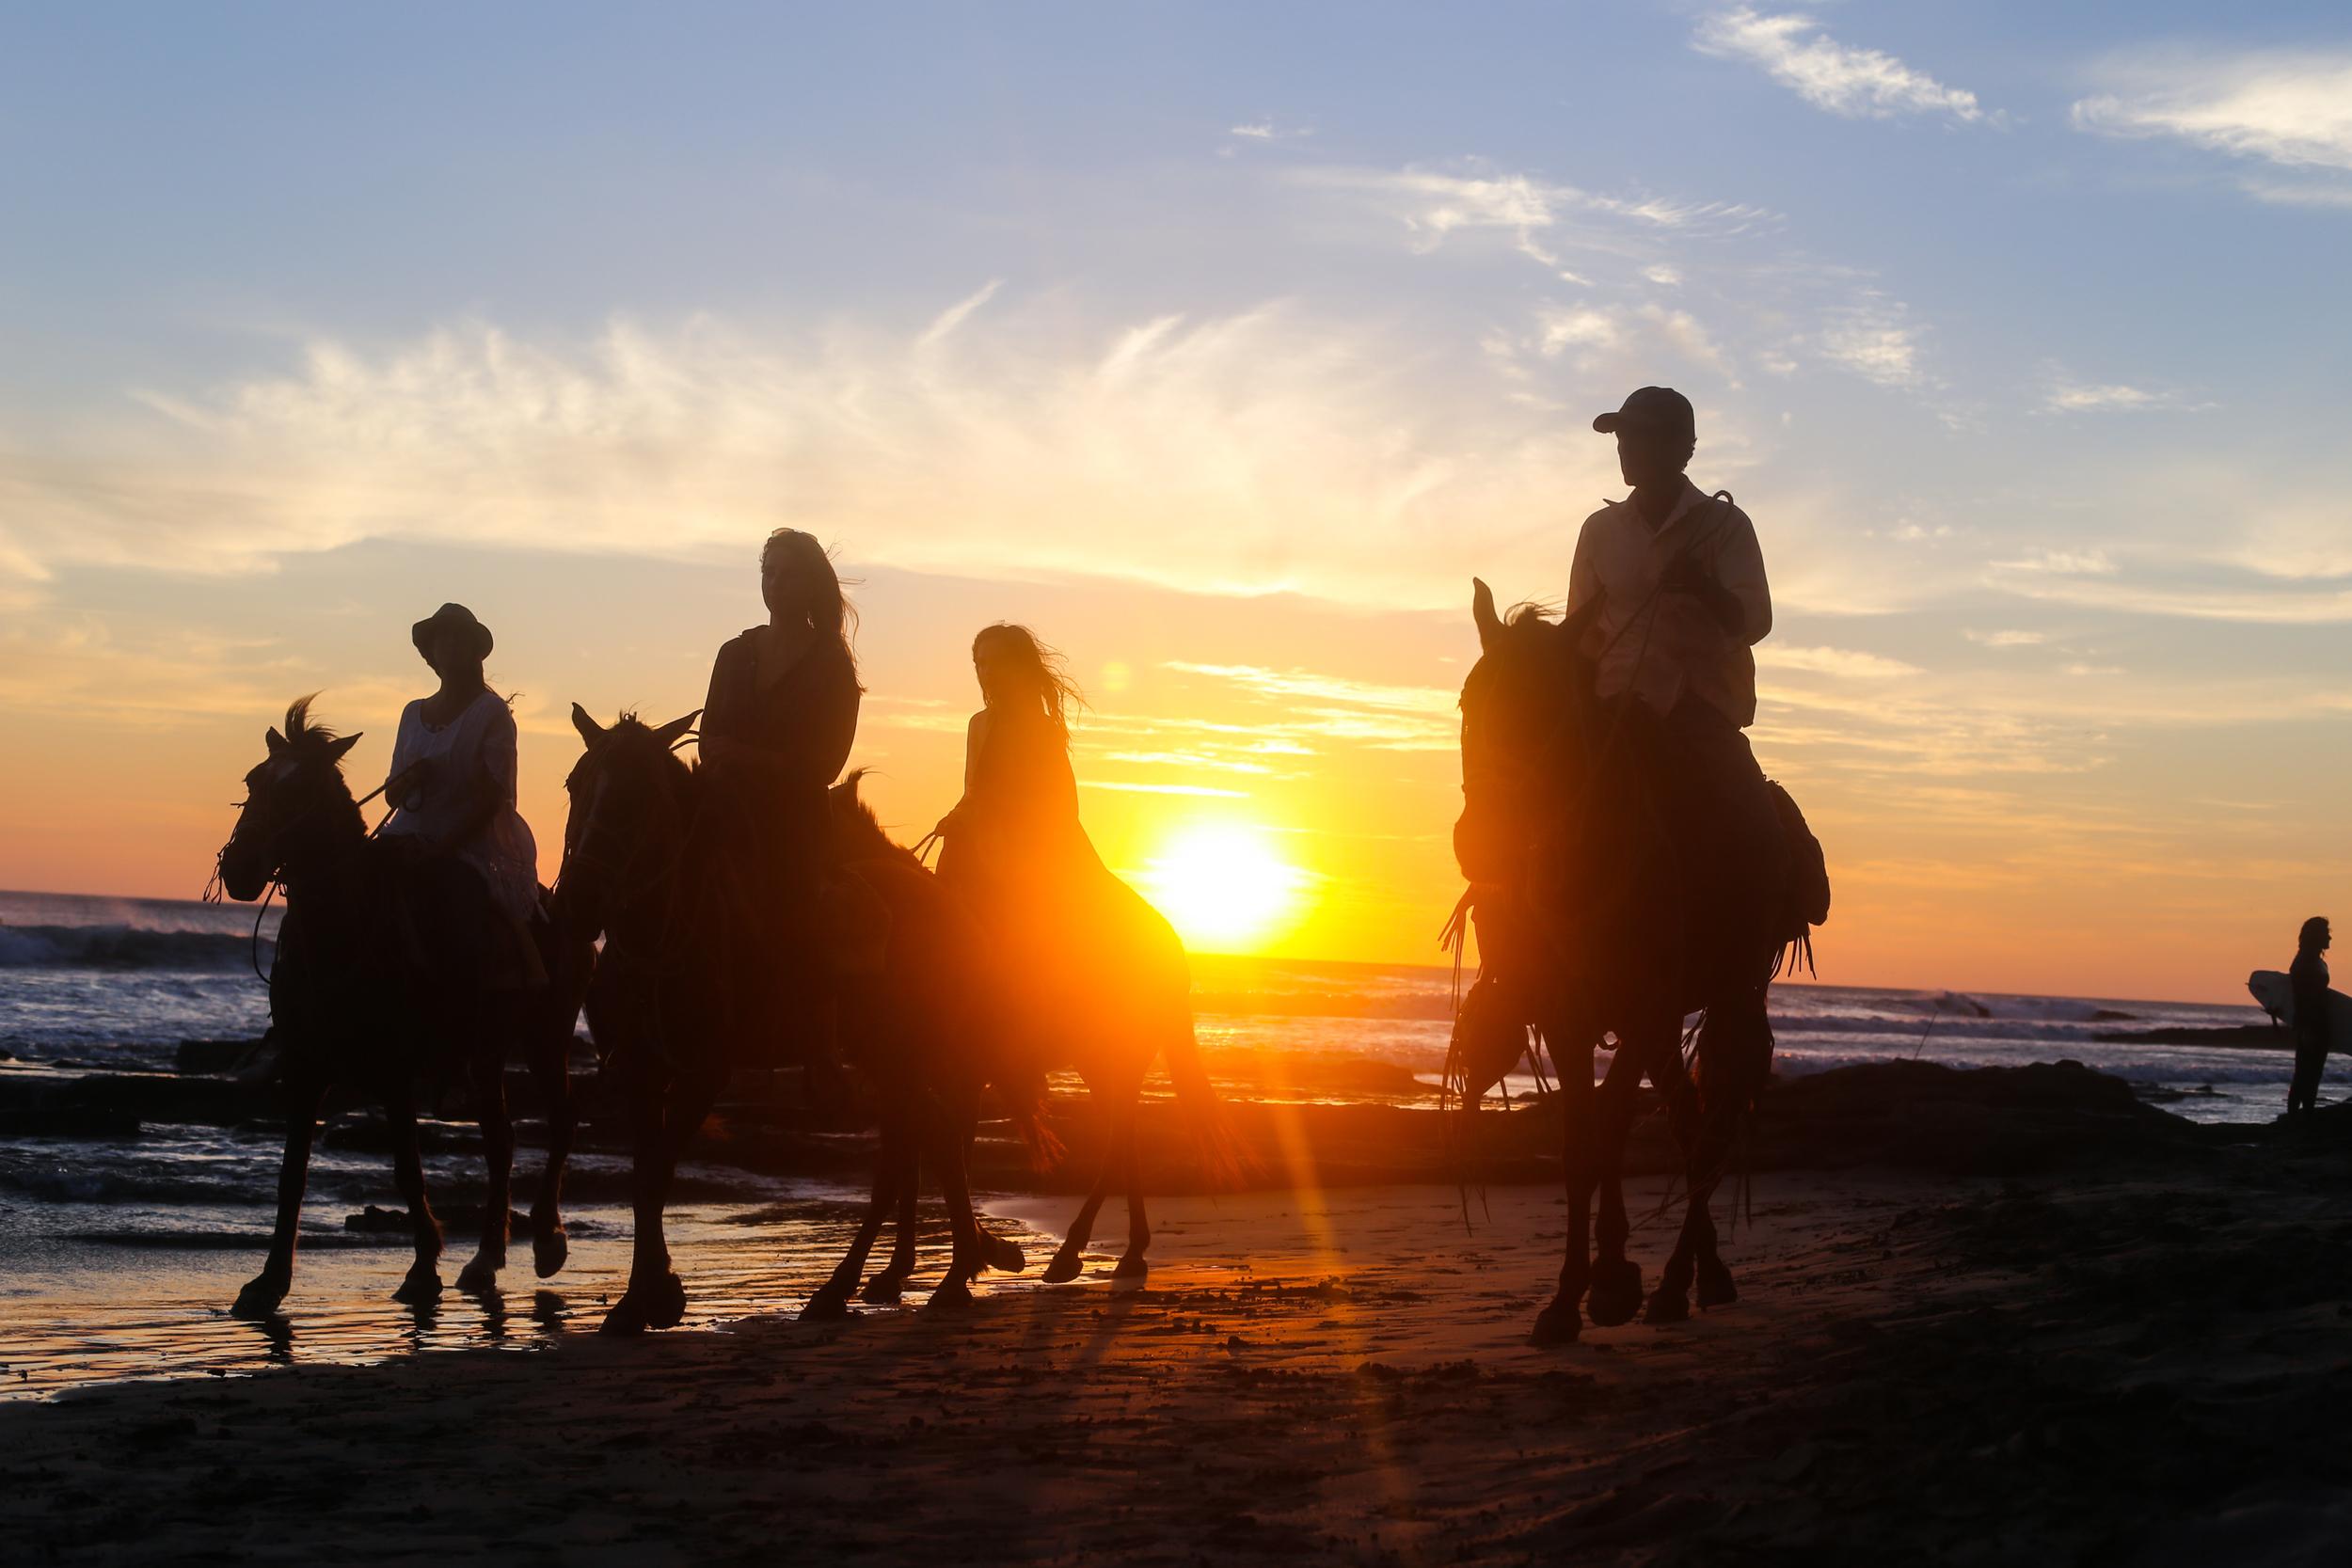 beach, toronto, kaylarocca, kaylaroccaphotography, ocean, wildandfree,travel photographer, yoga, fashion-12IMG_0131.jpg